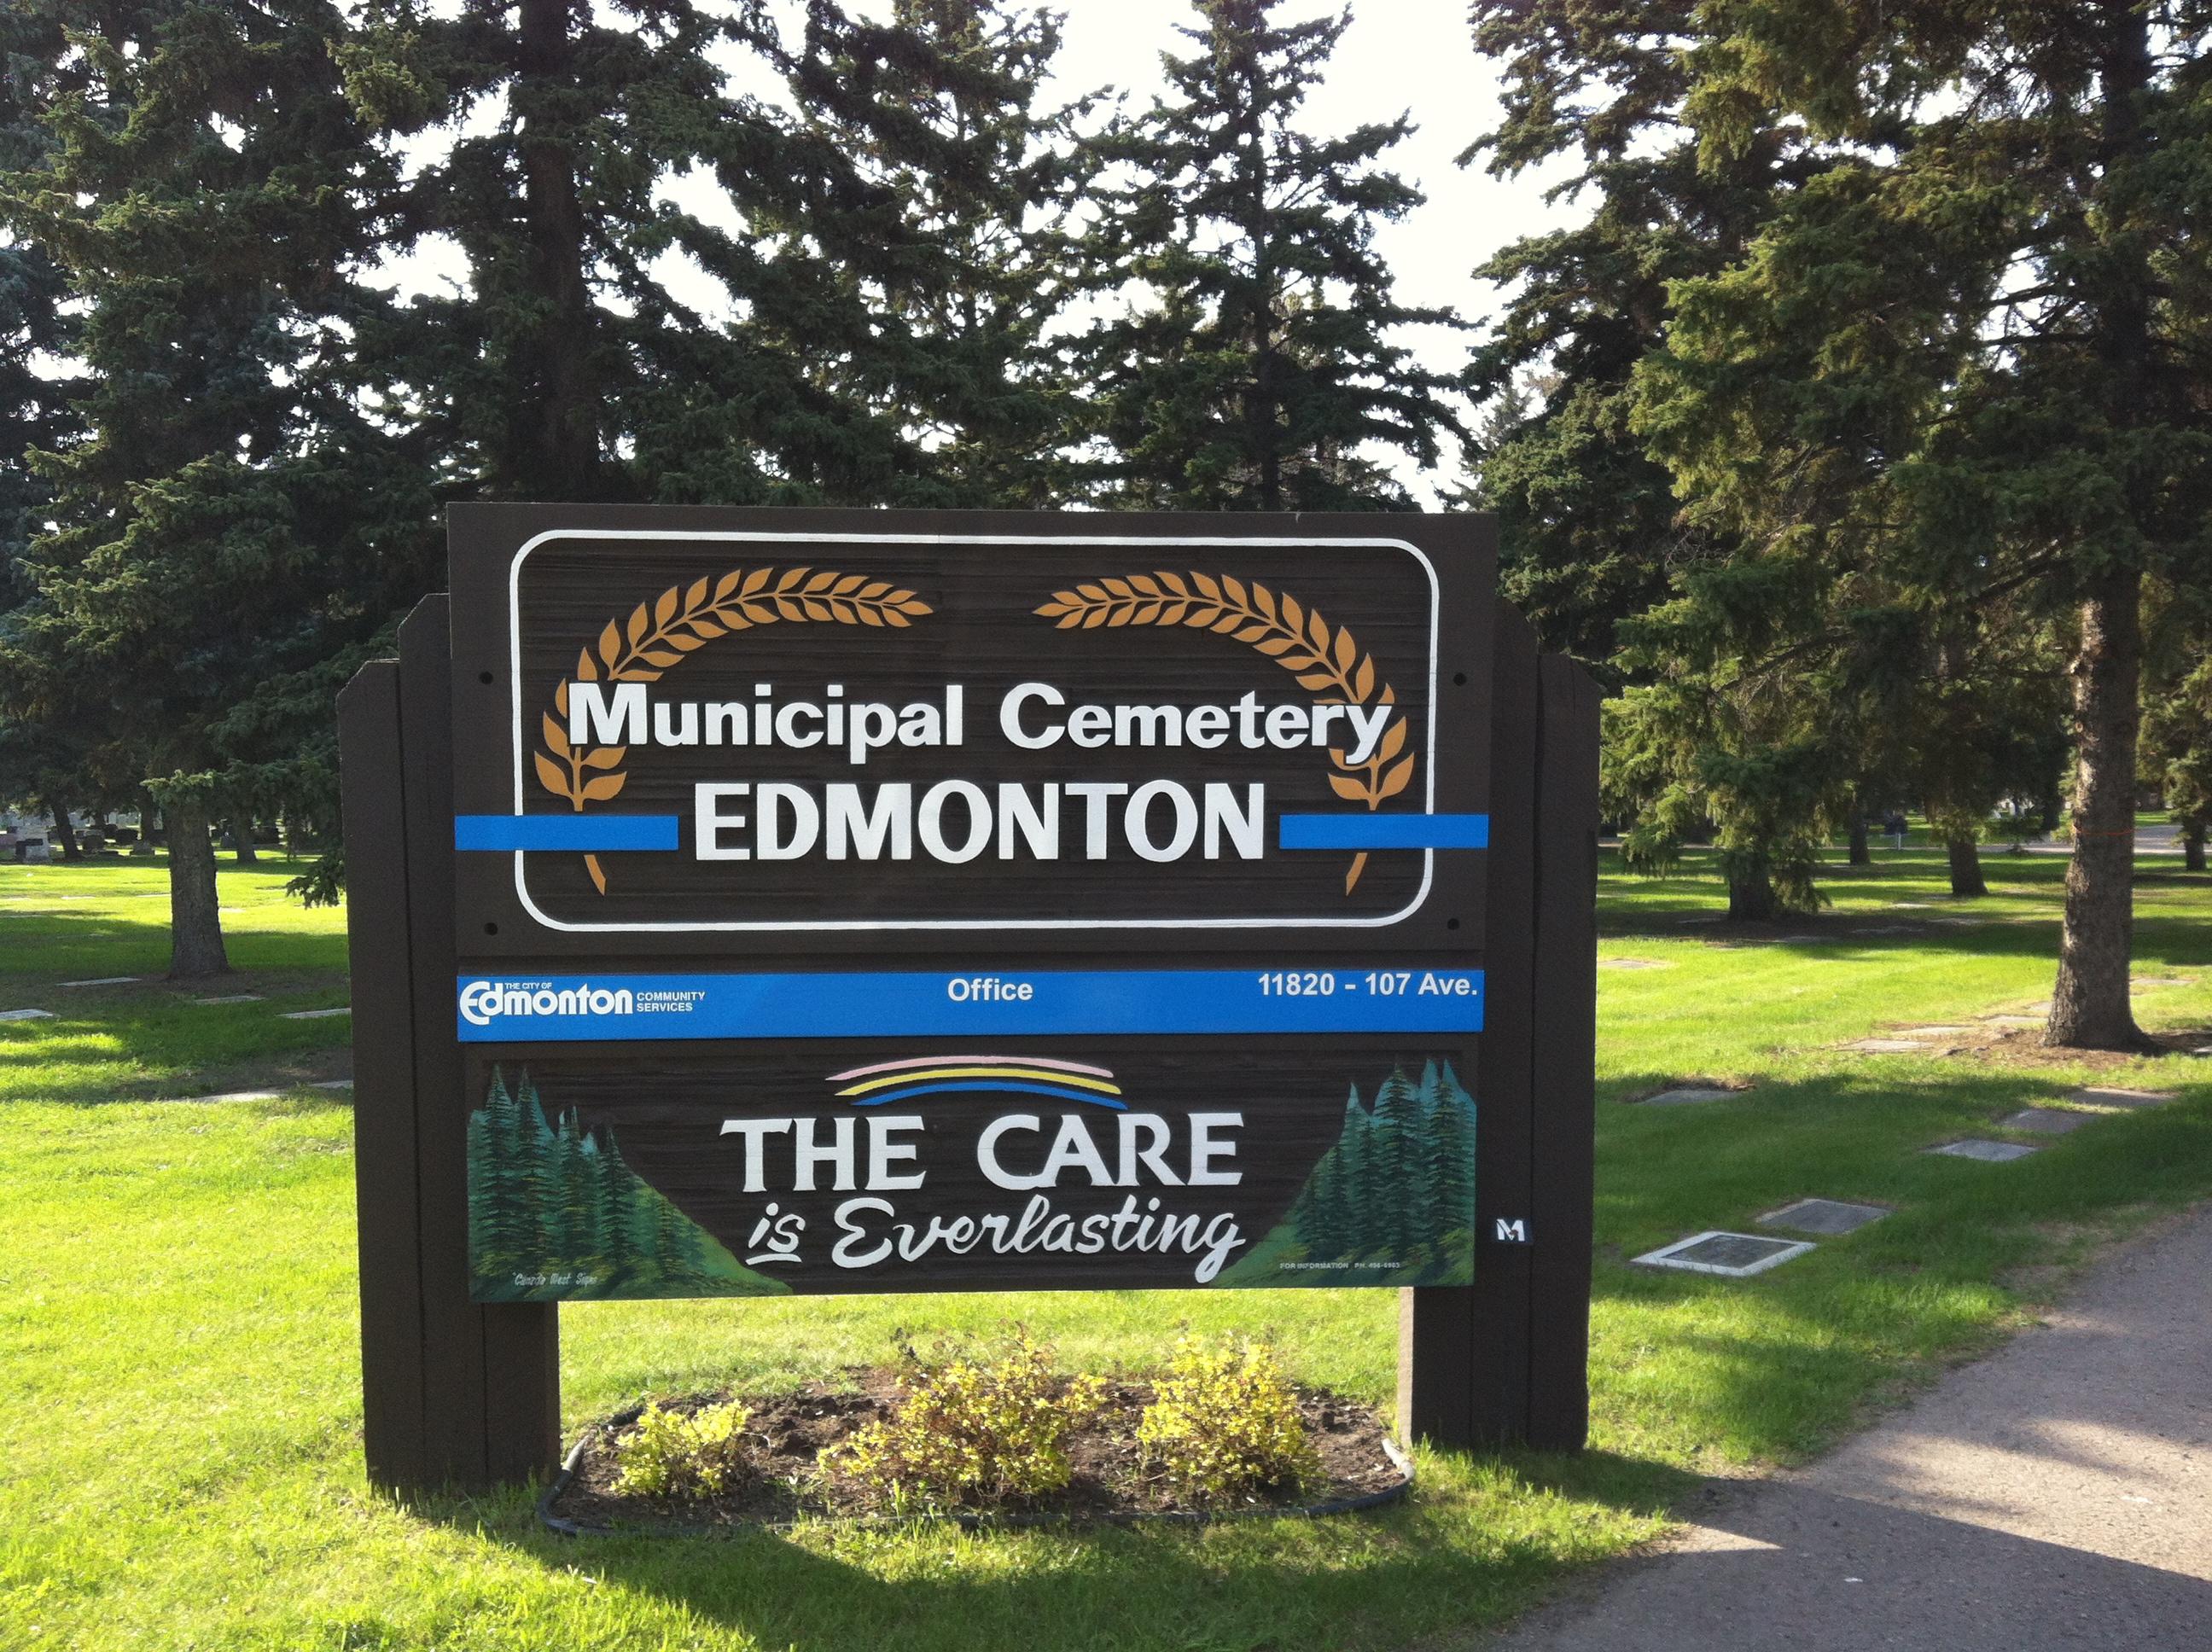 Edmonton Municipal Cemetery